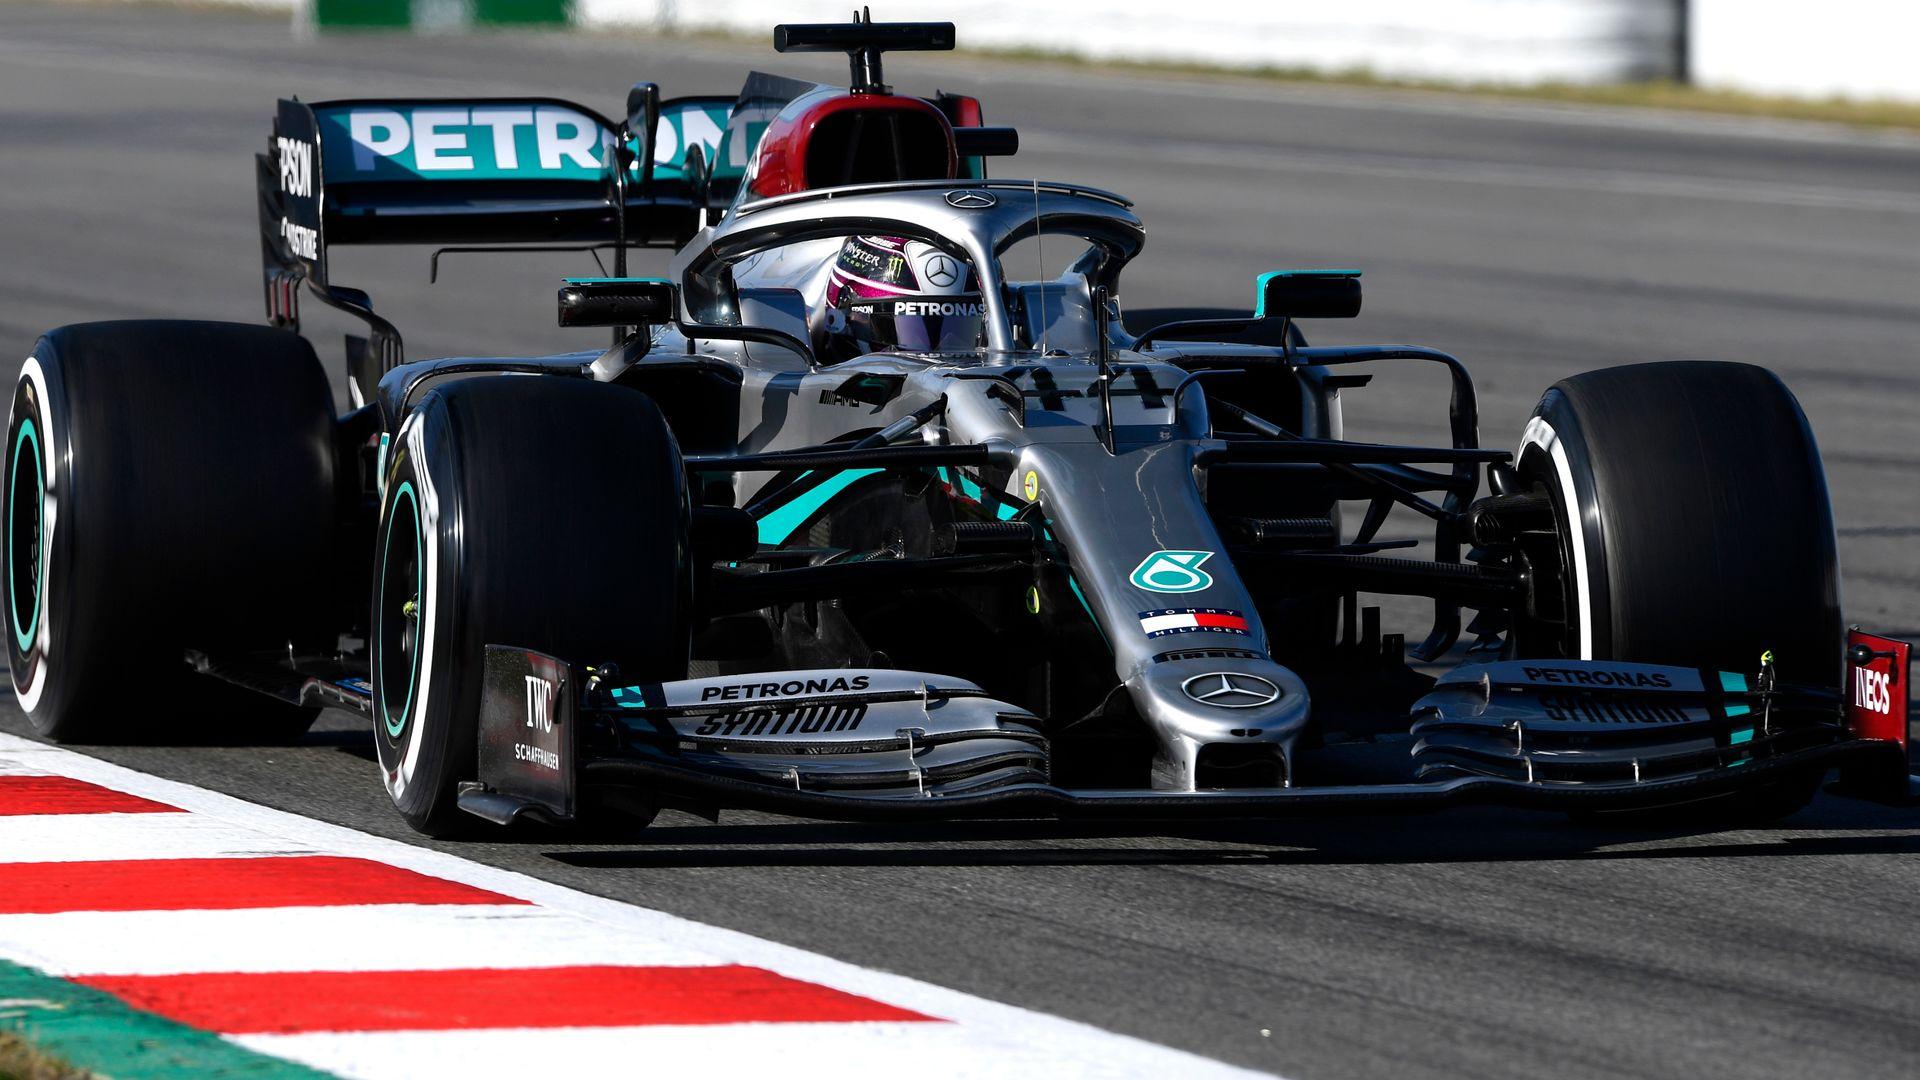 Hamilton, Bottas to drive in Mercedes test - sky sports